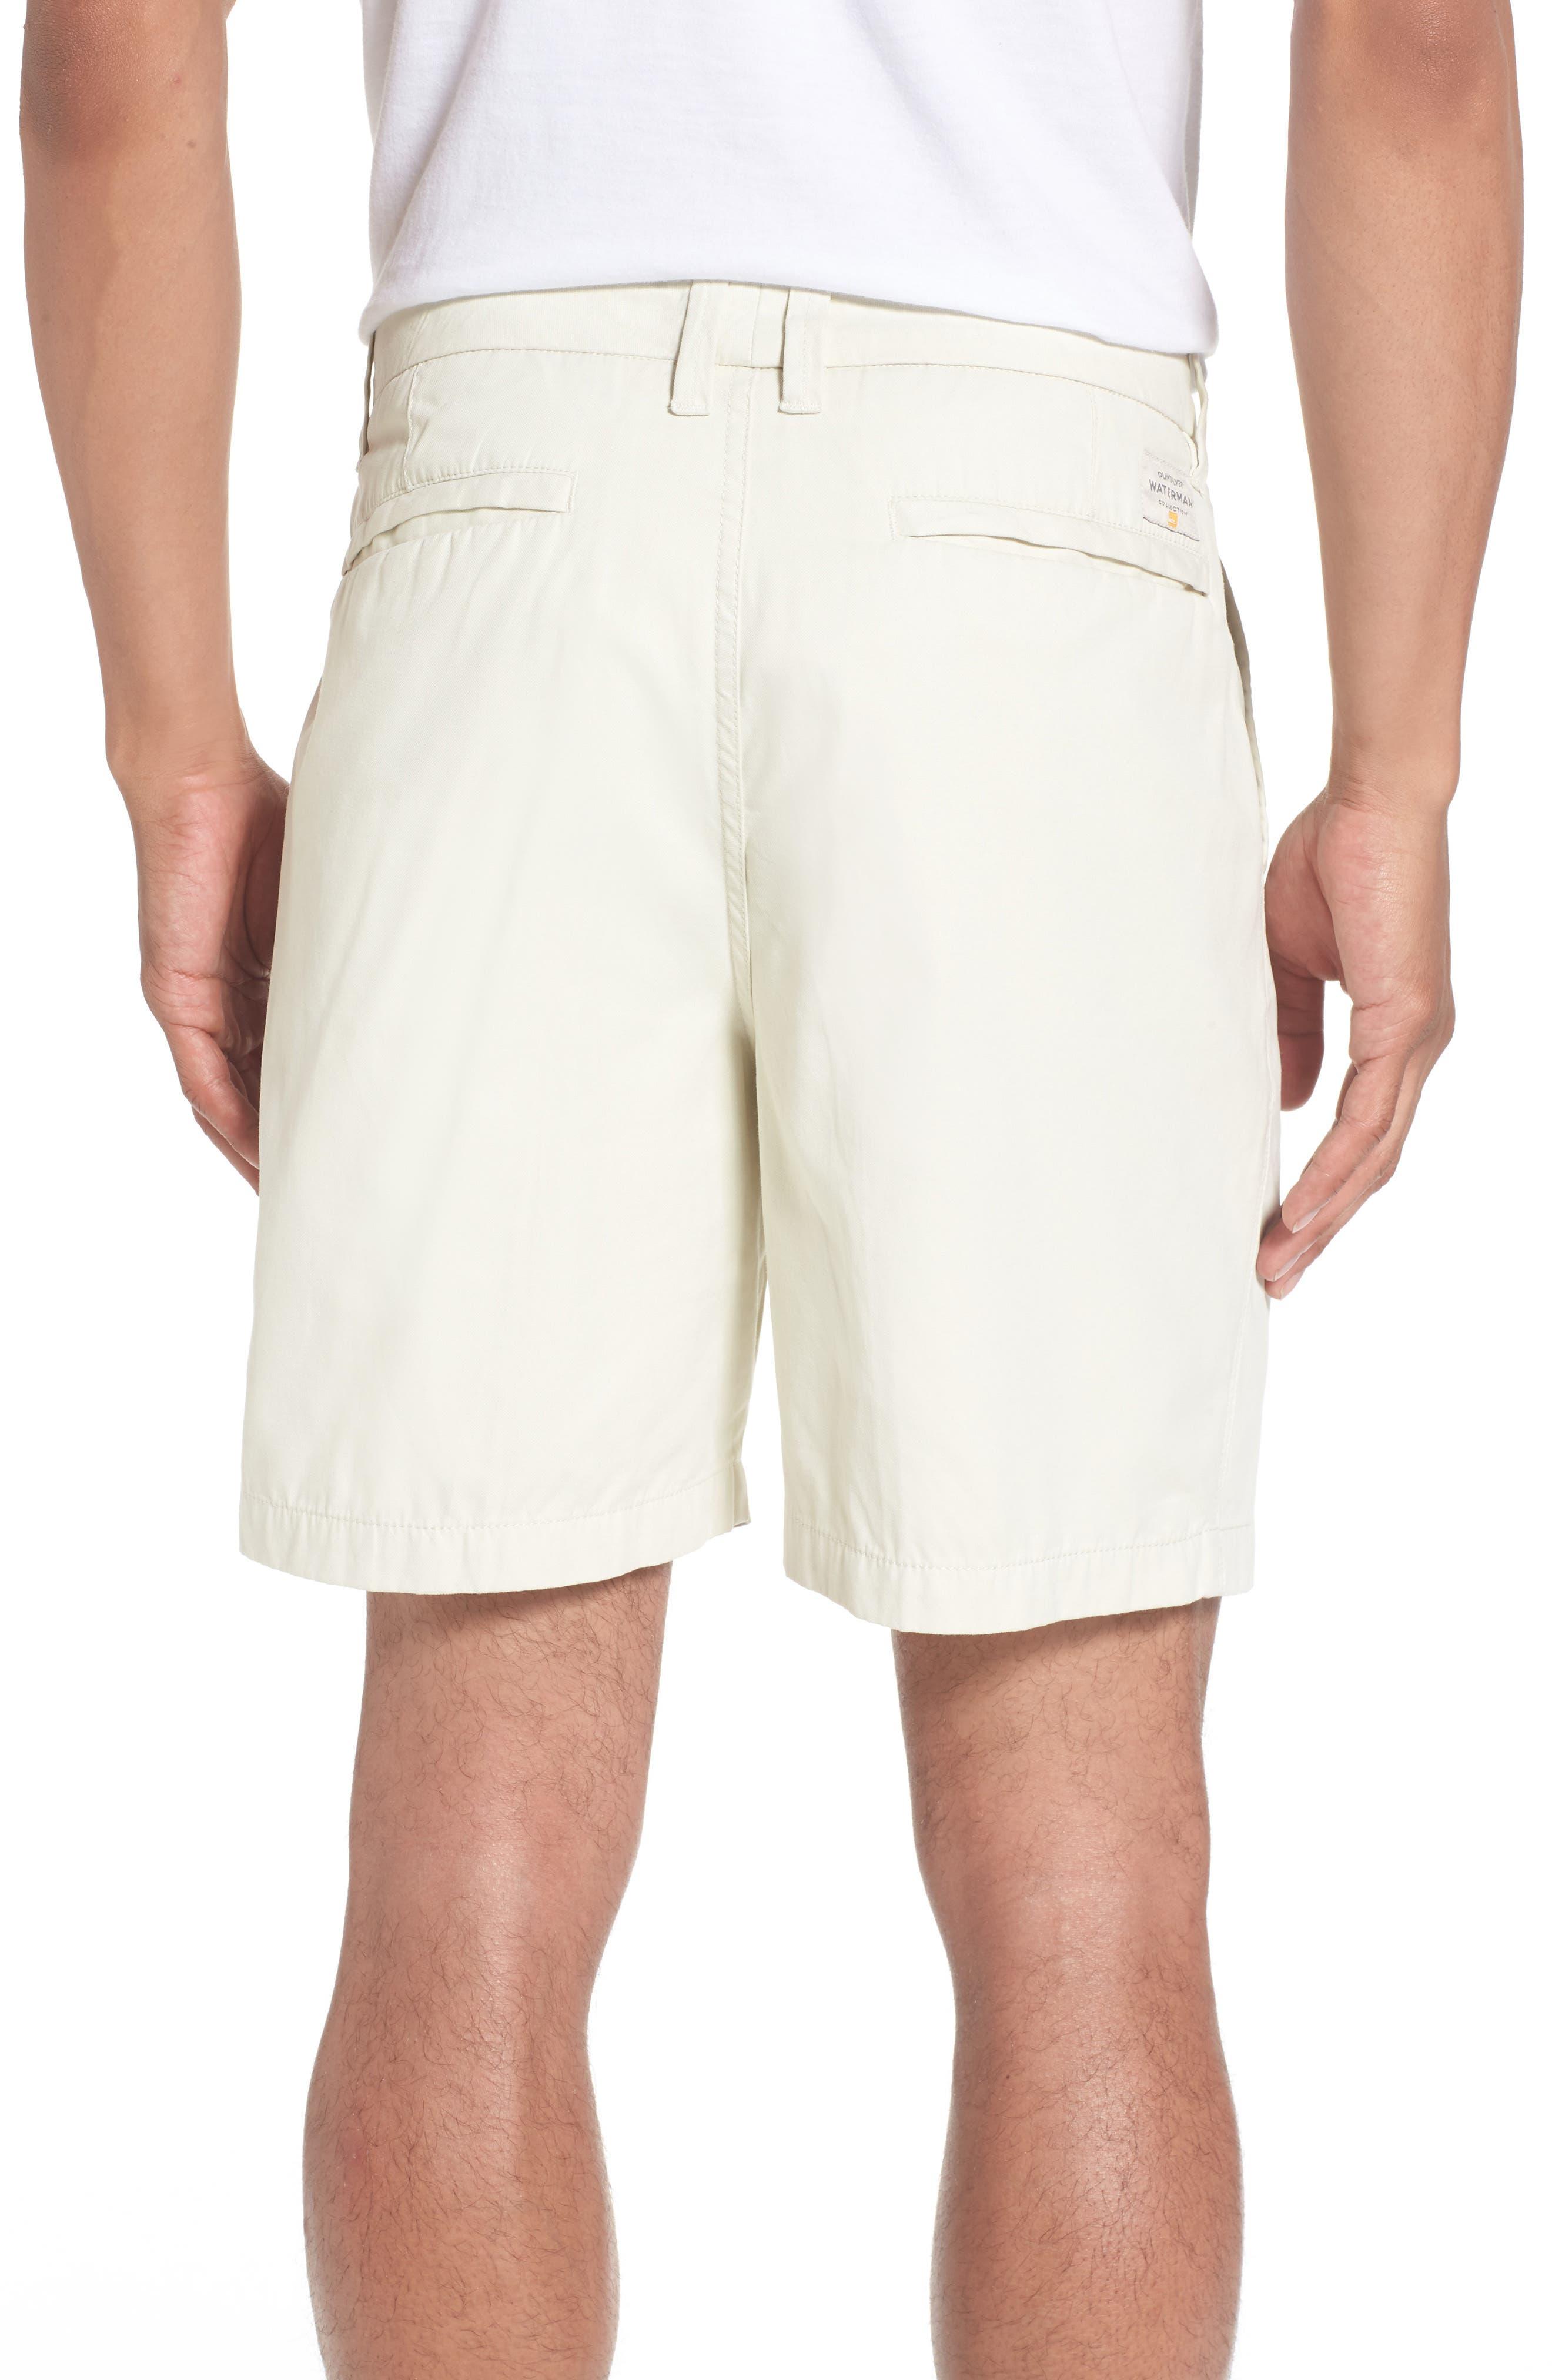 Shortie Chino Shorts,                             Alternate thumbnail 2, color,                             108